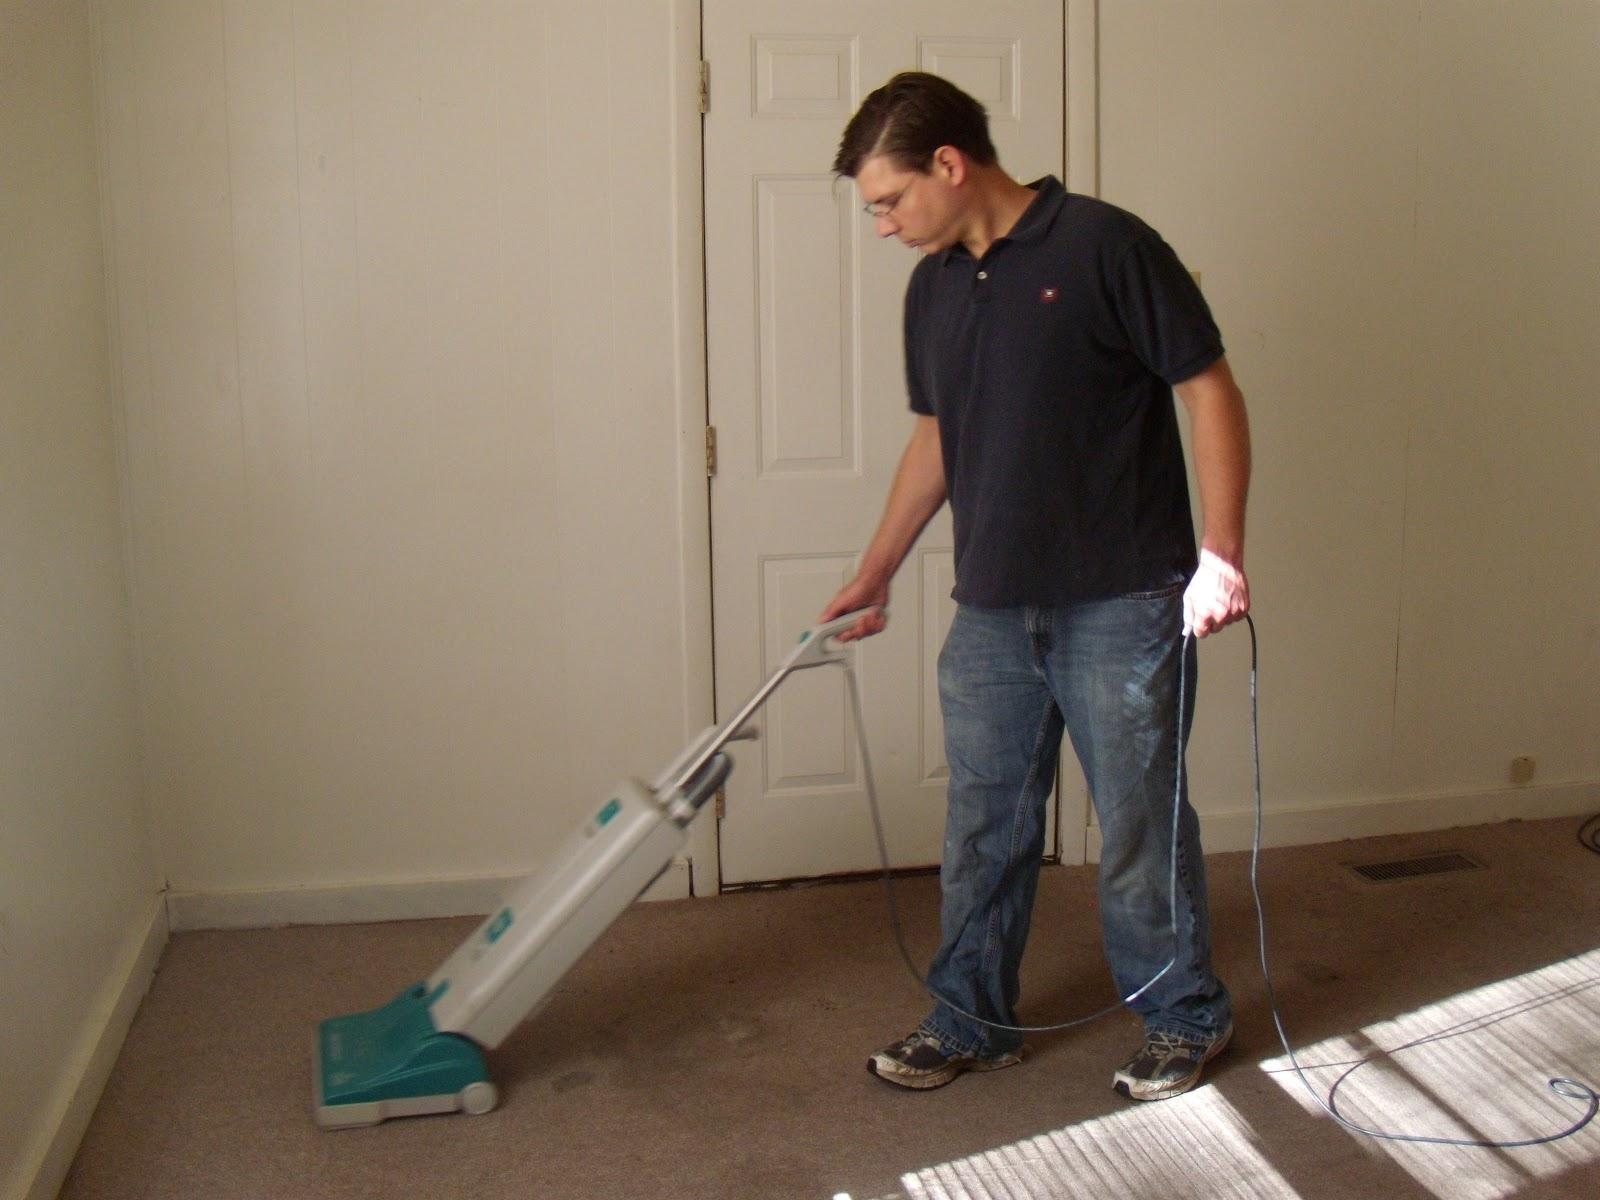 Vacuuming Carpet - Viewing Gallery